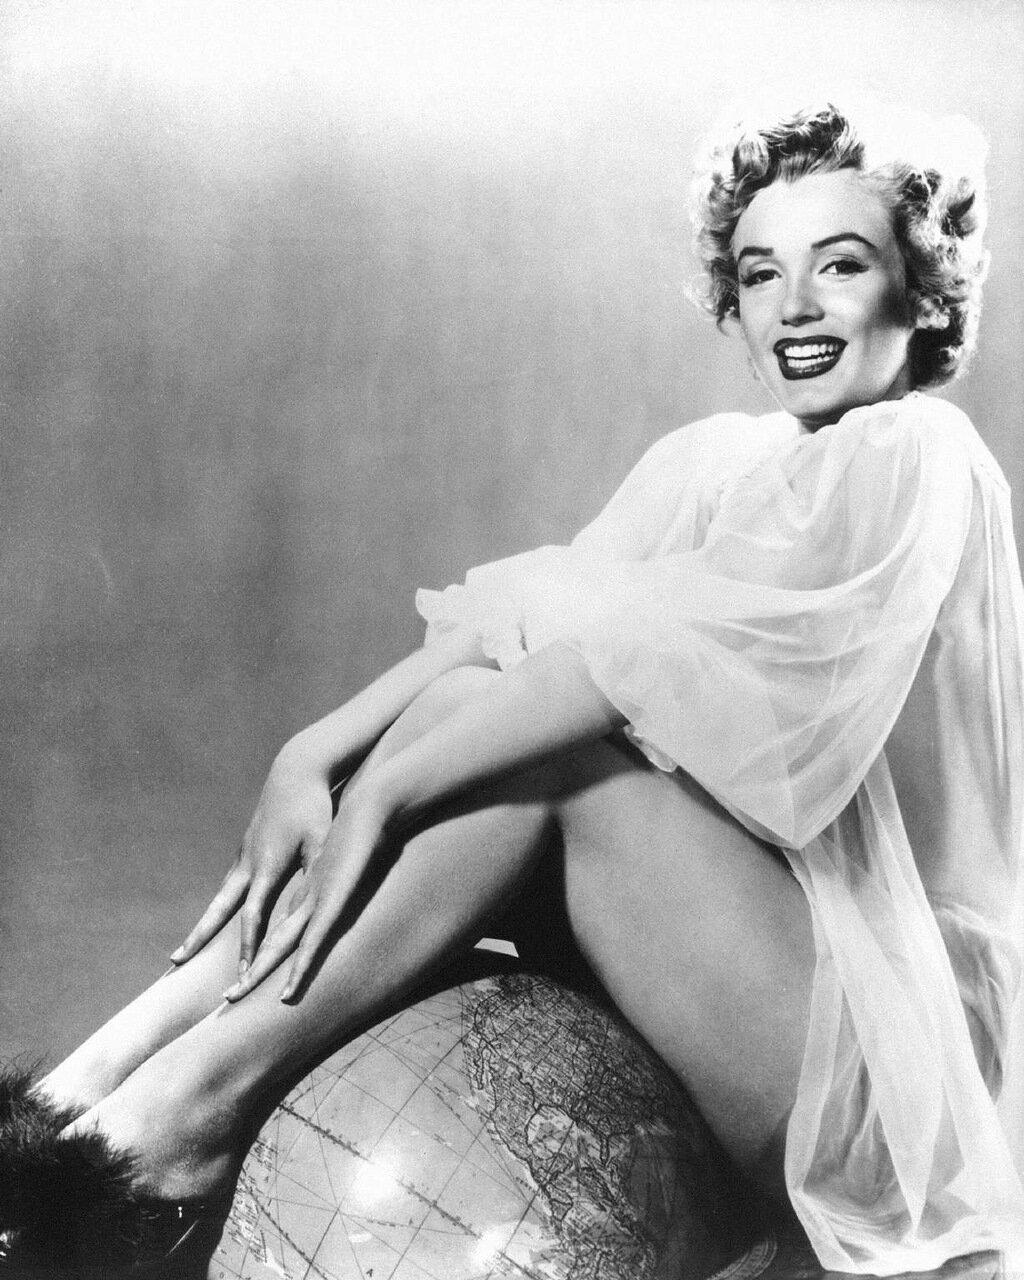 08/00/1997. Marilyn Monroe (Files)